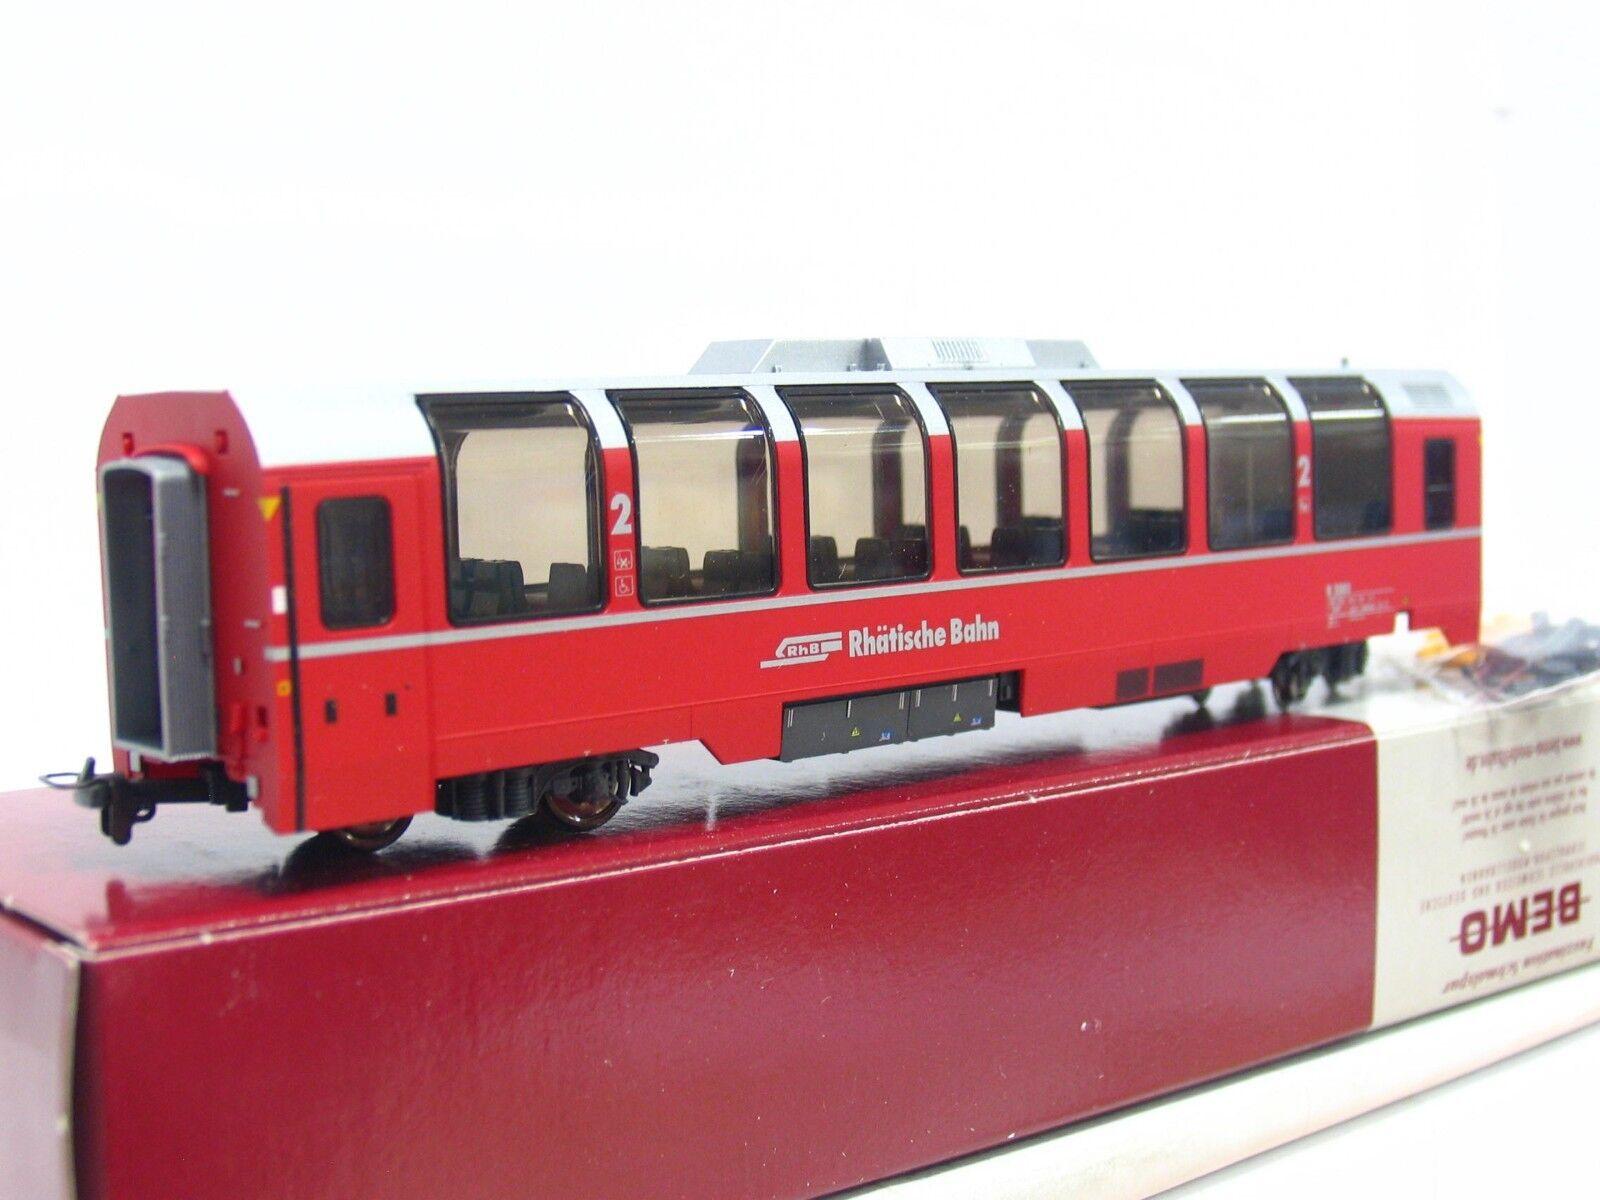 Bemo h0m 3294 103 Panorama Wagon B 2503 2. Class RhB OVP (rb3335)